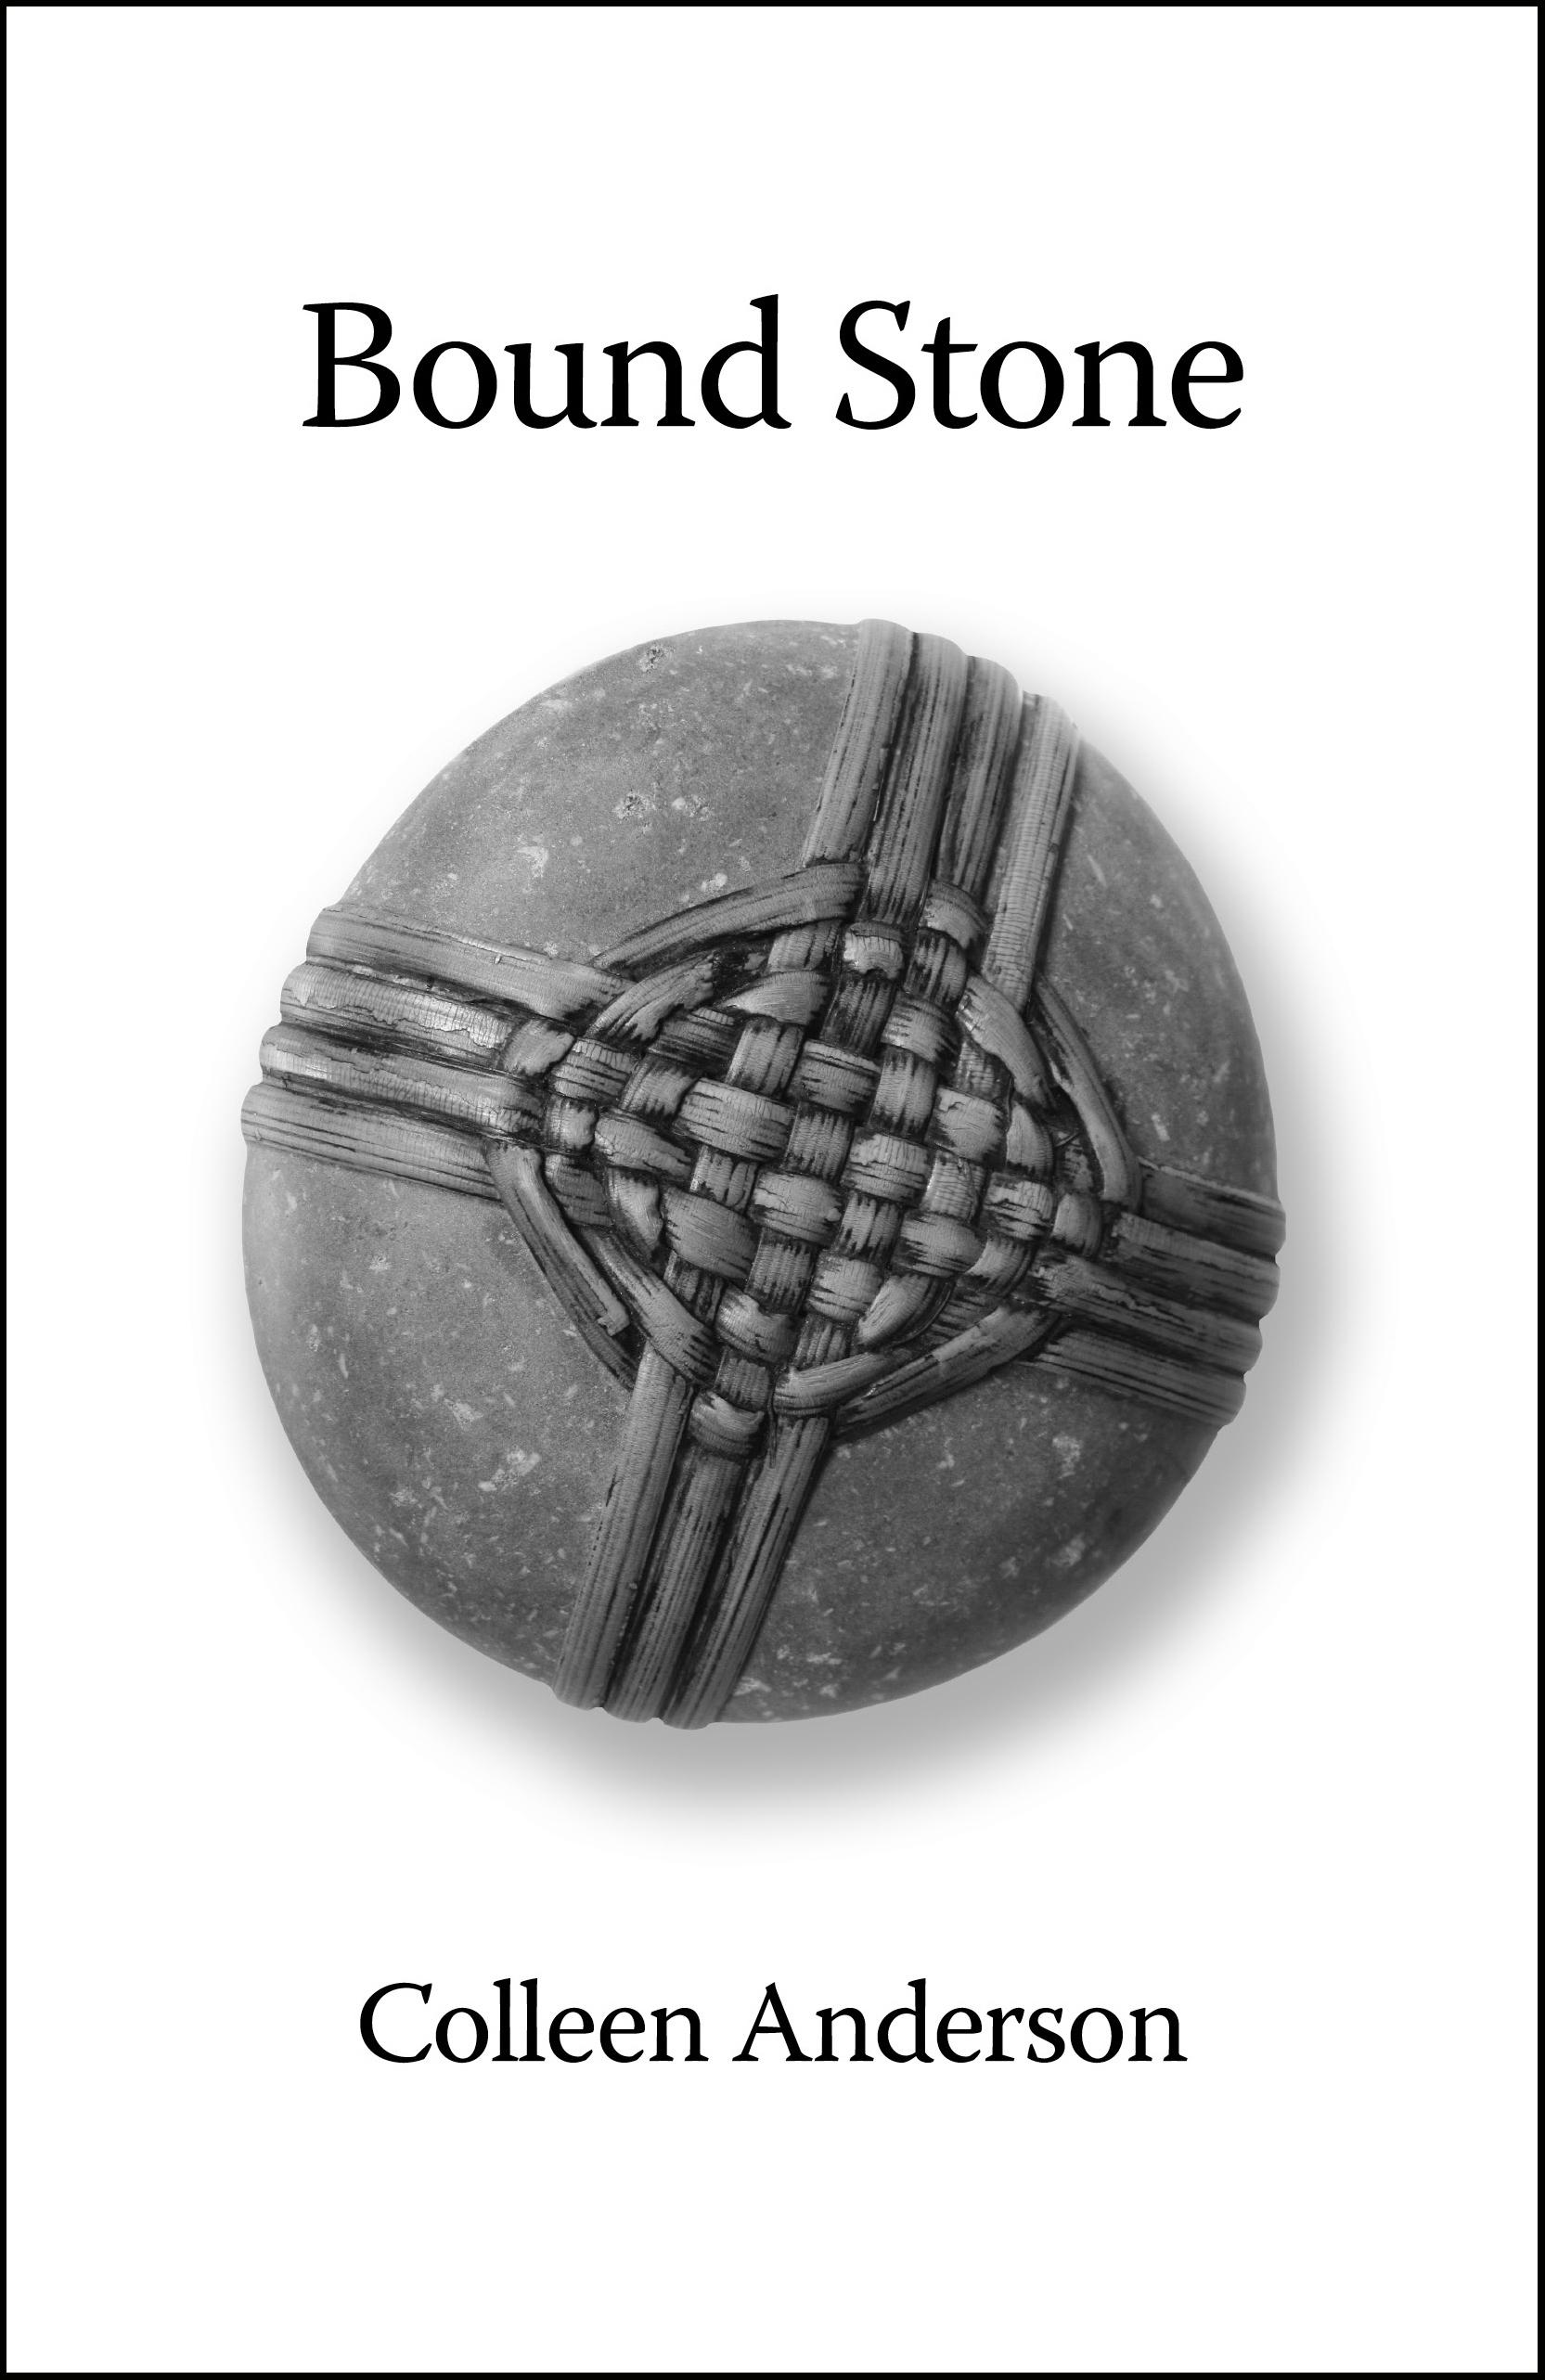 Bound_Stone_cover.jpg